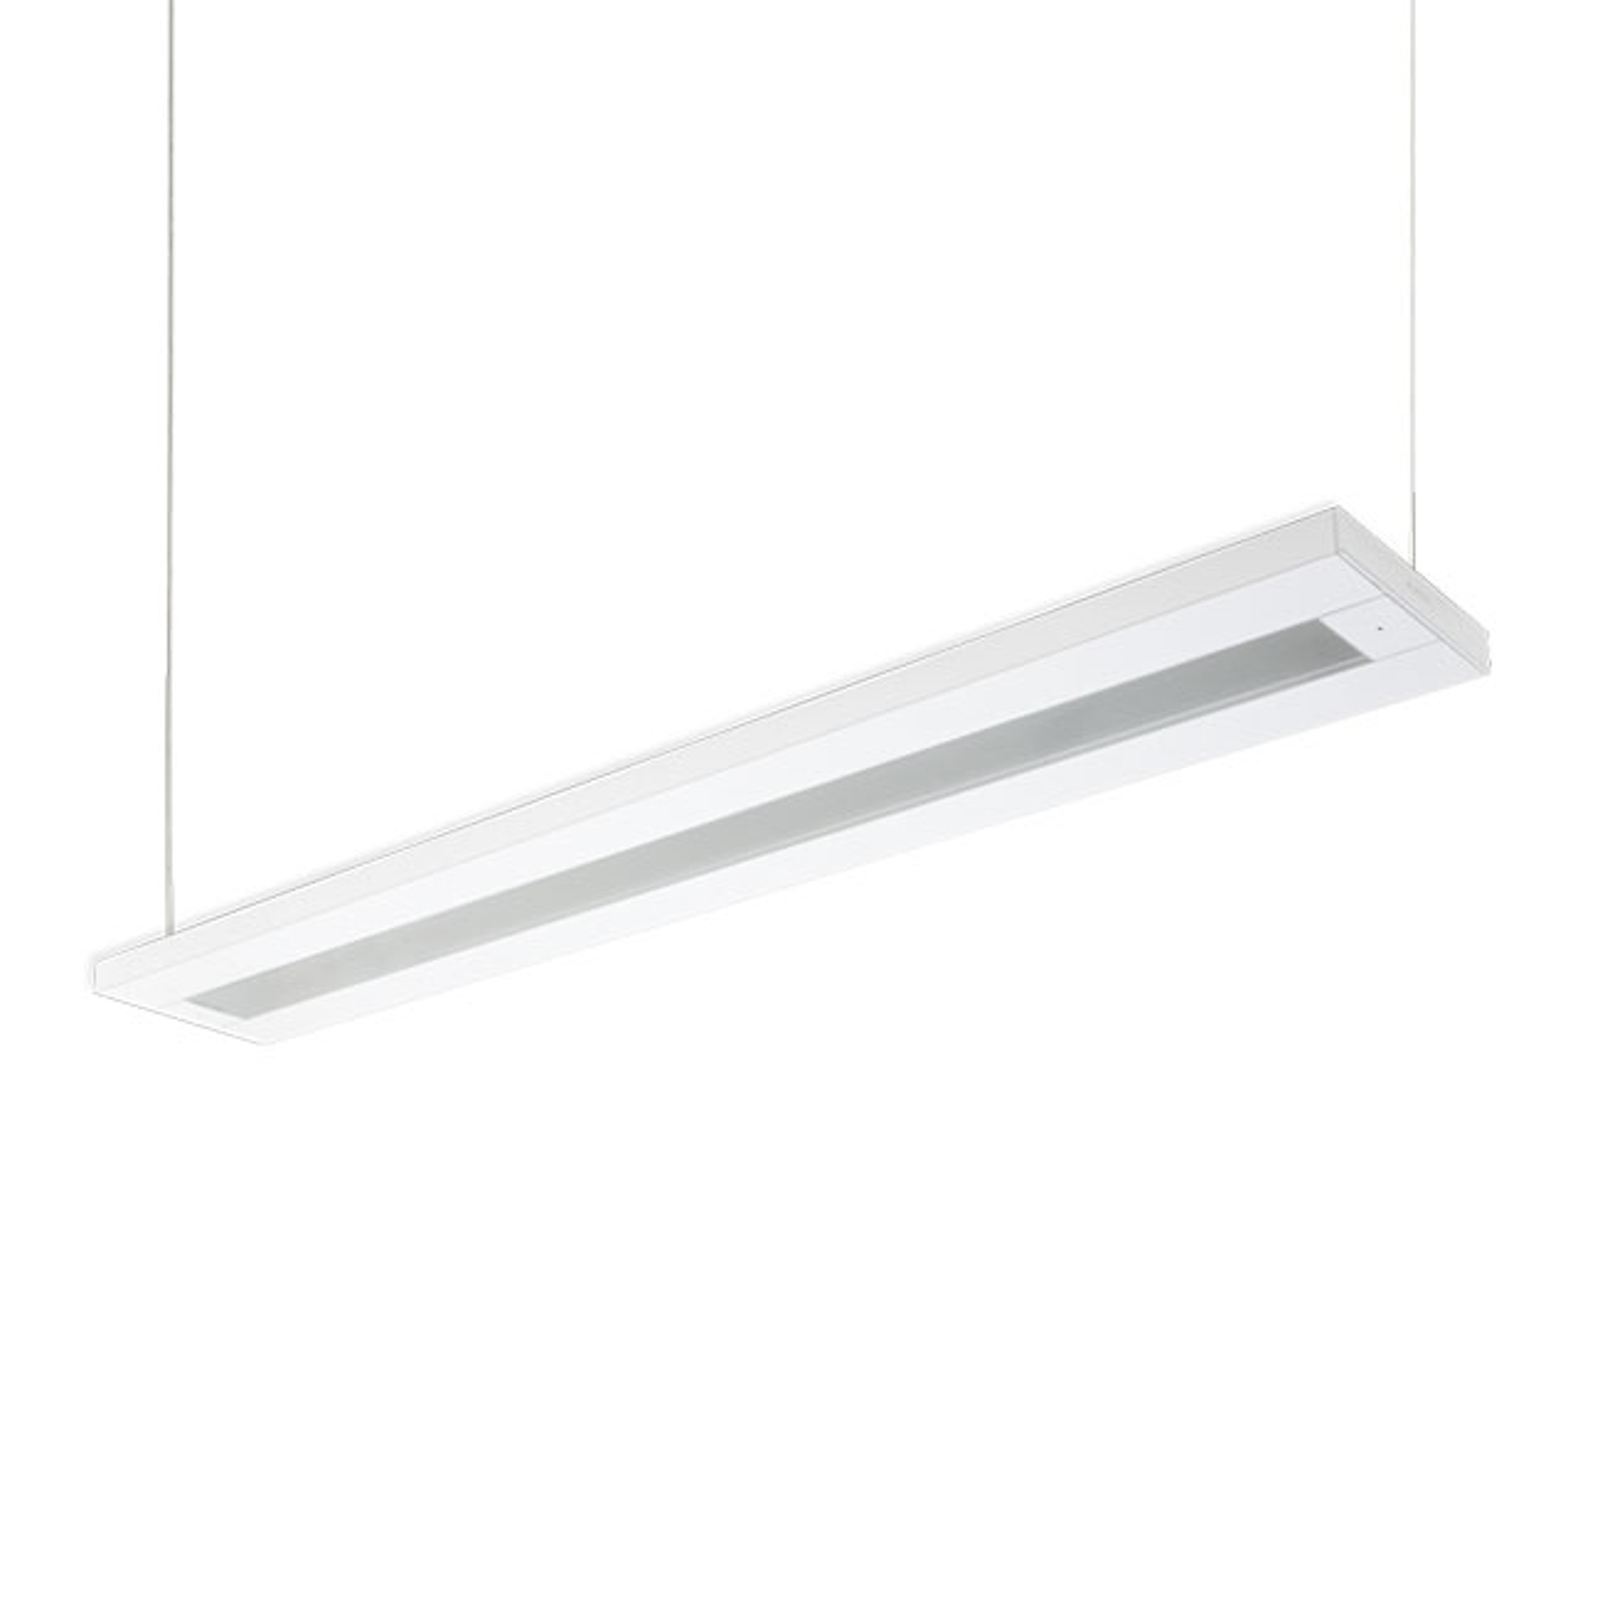 Lampa wisząca LED C20-P4 MP, 127cm, biała, 33W